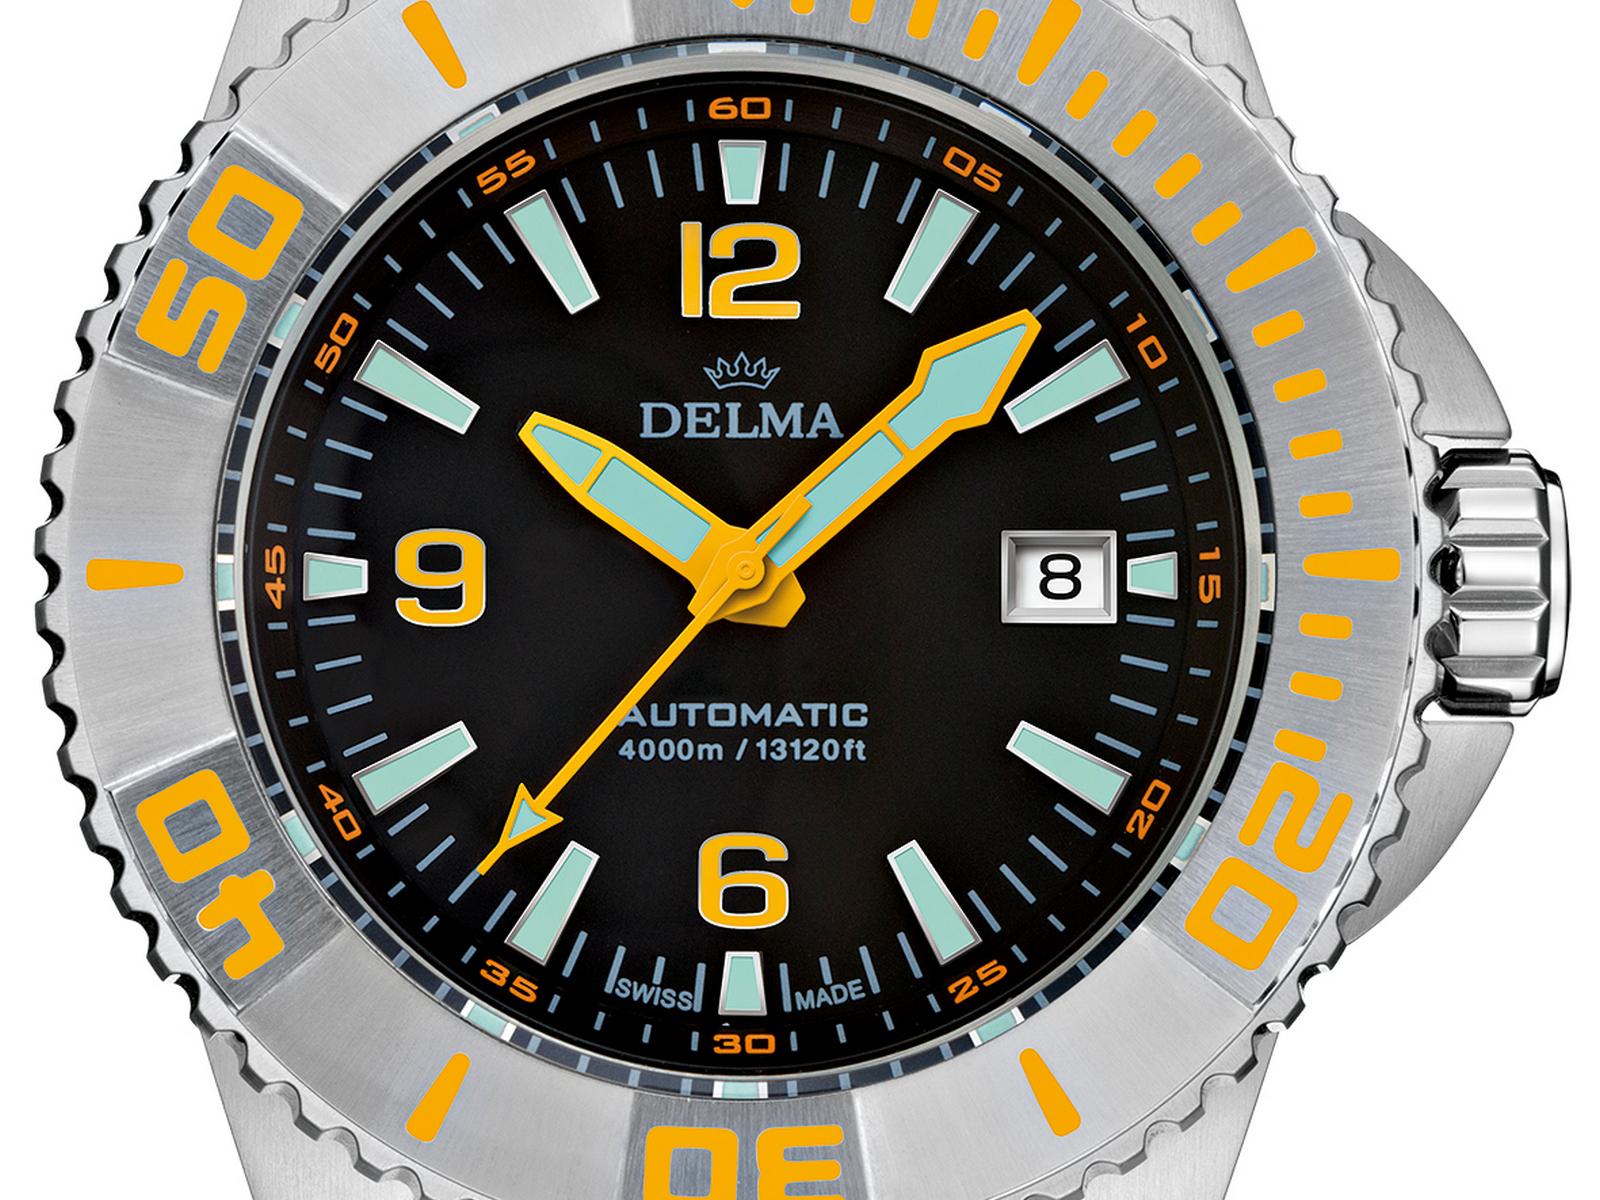 Delma_BlueShark_41701_700_6_034